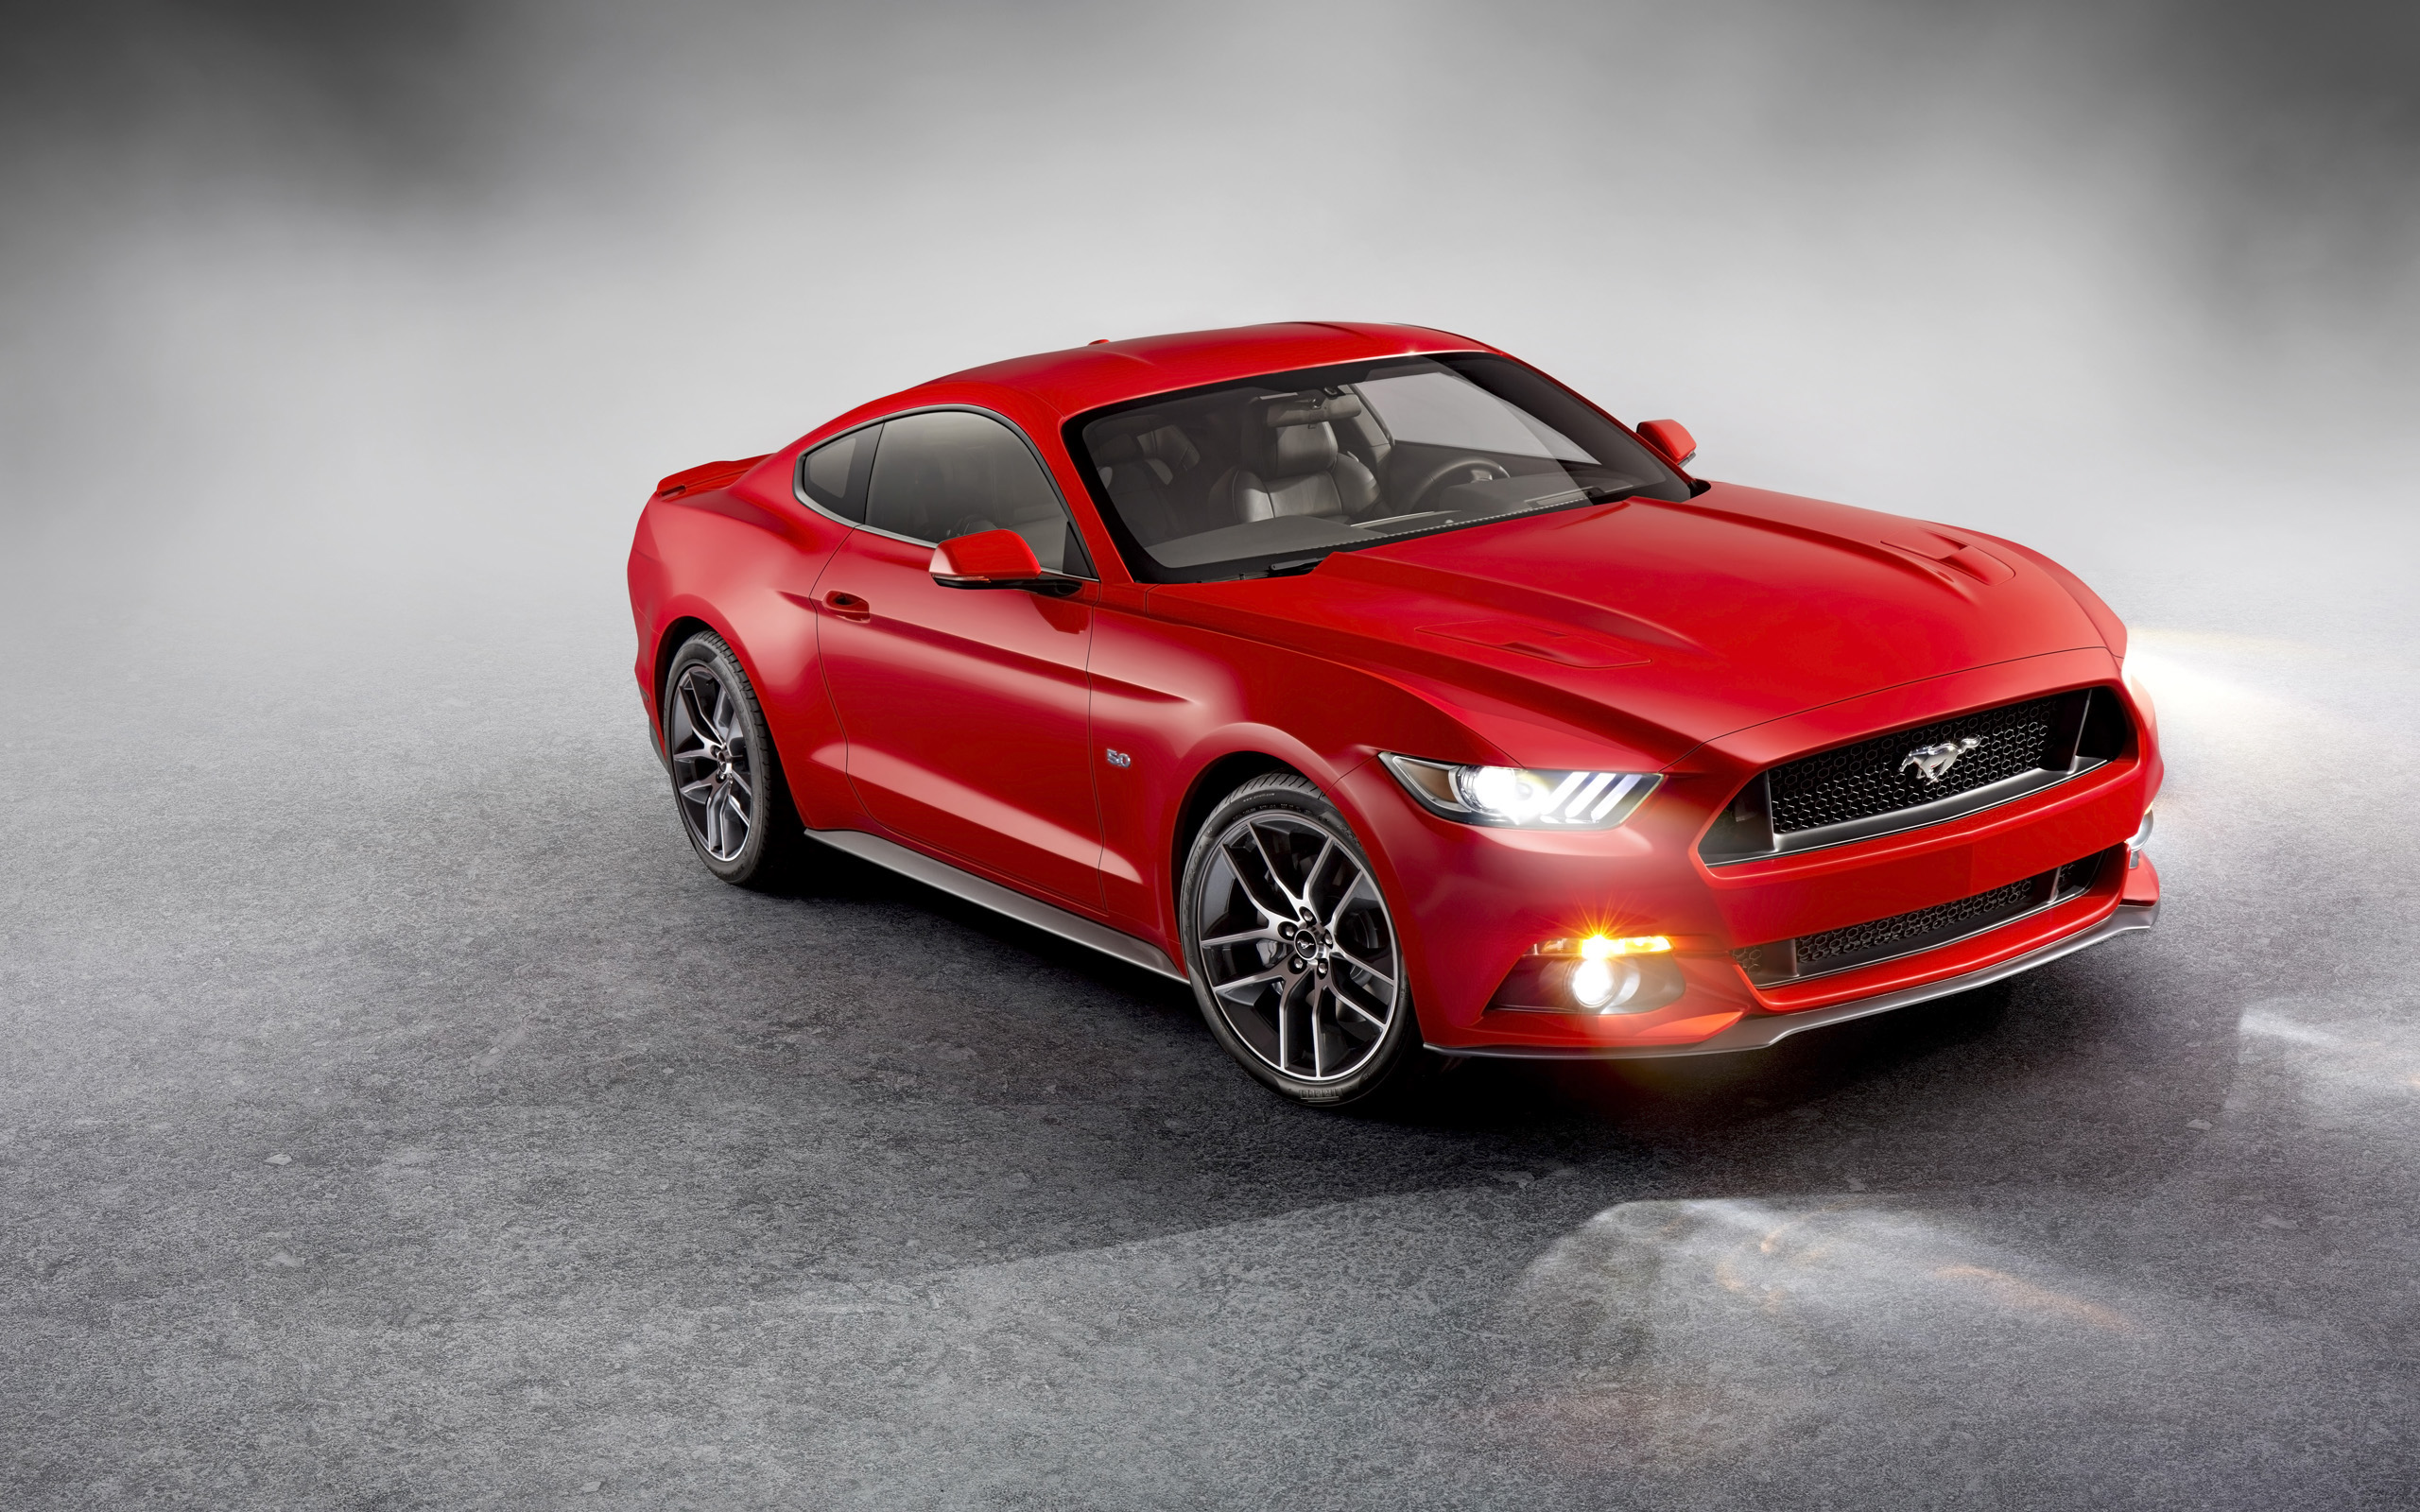 Ford Mustang  3.7 AT (305 HP) - dane techniczne, wymiary, spalanie i opinie